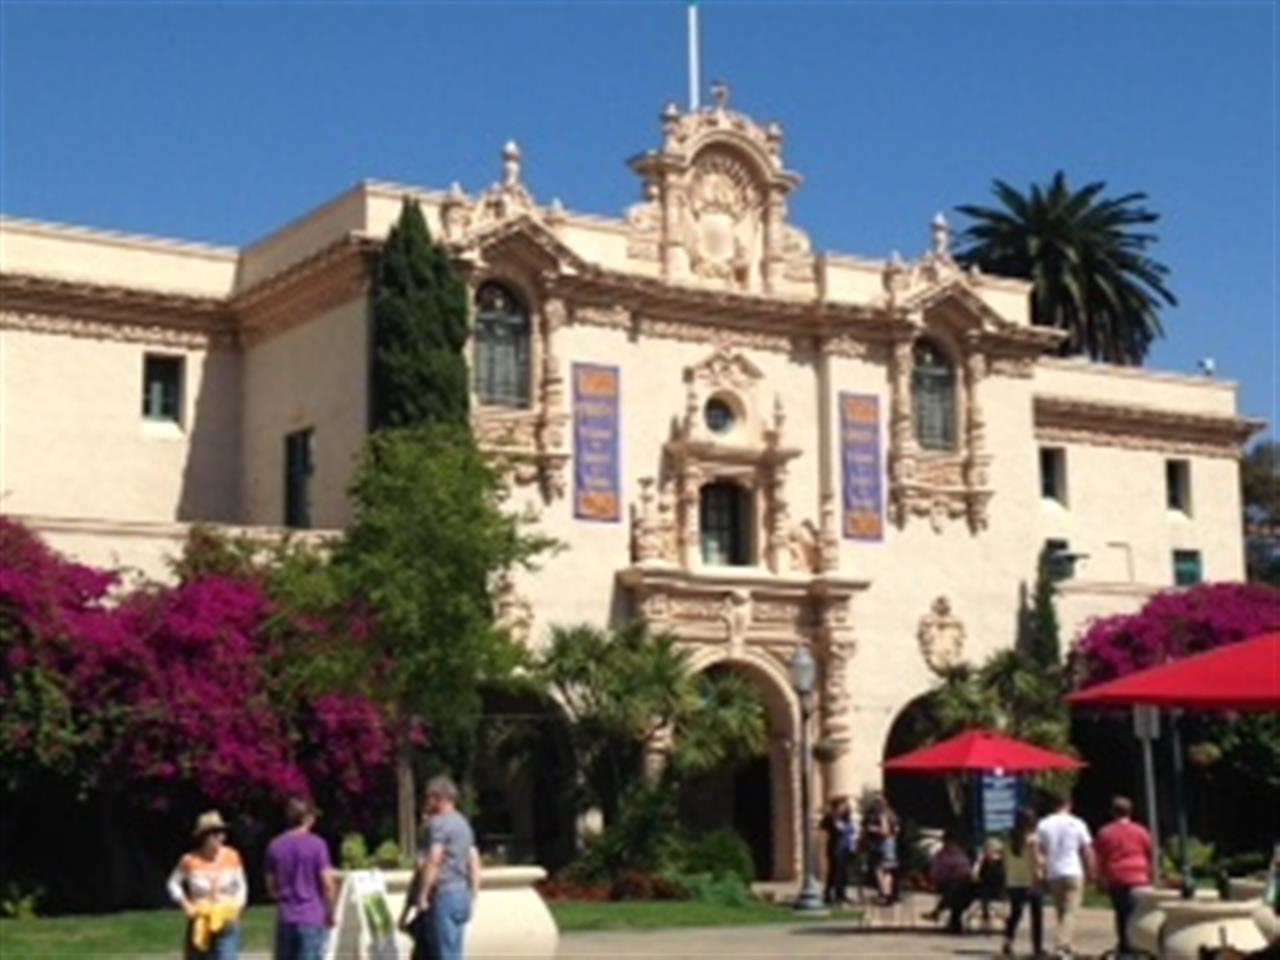 #San Diego #House of Hospitality #LeadingRElocal